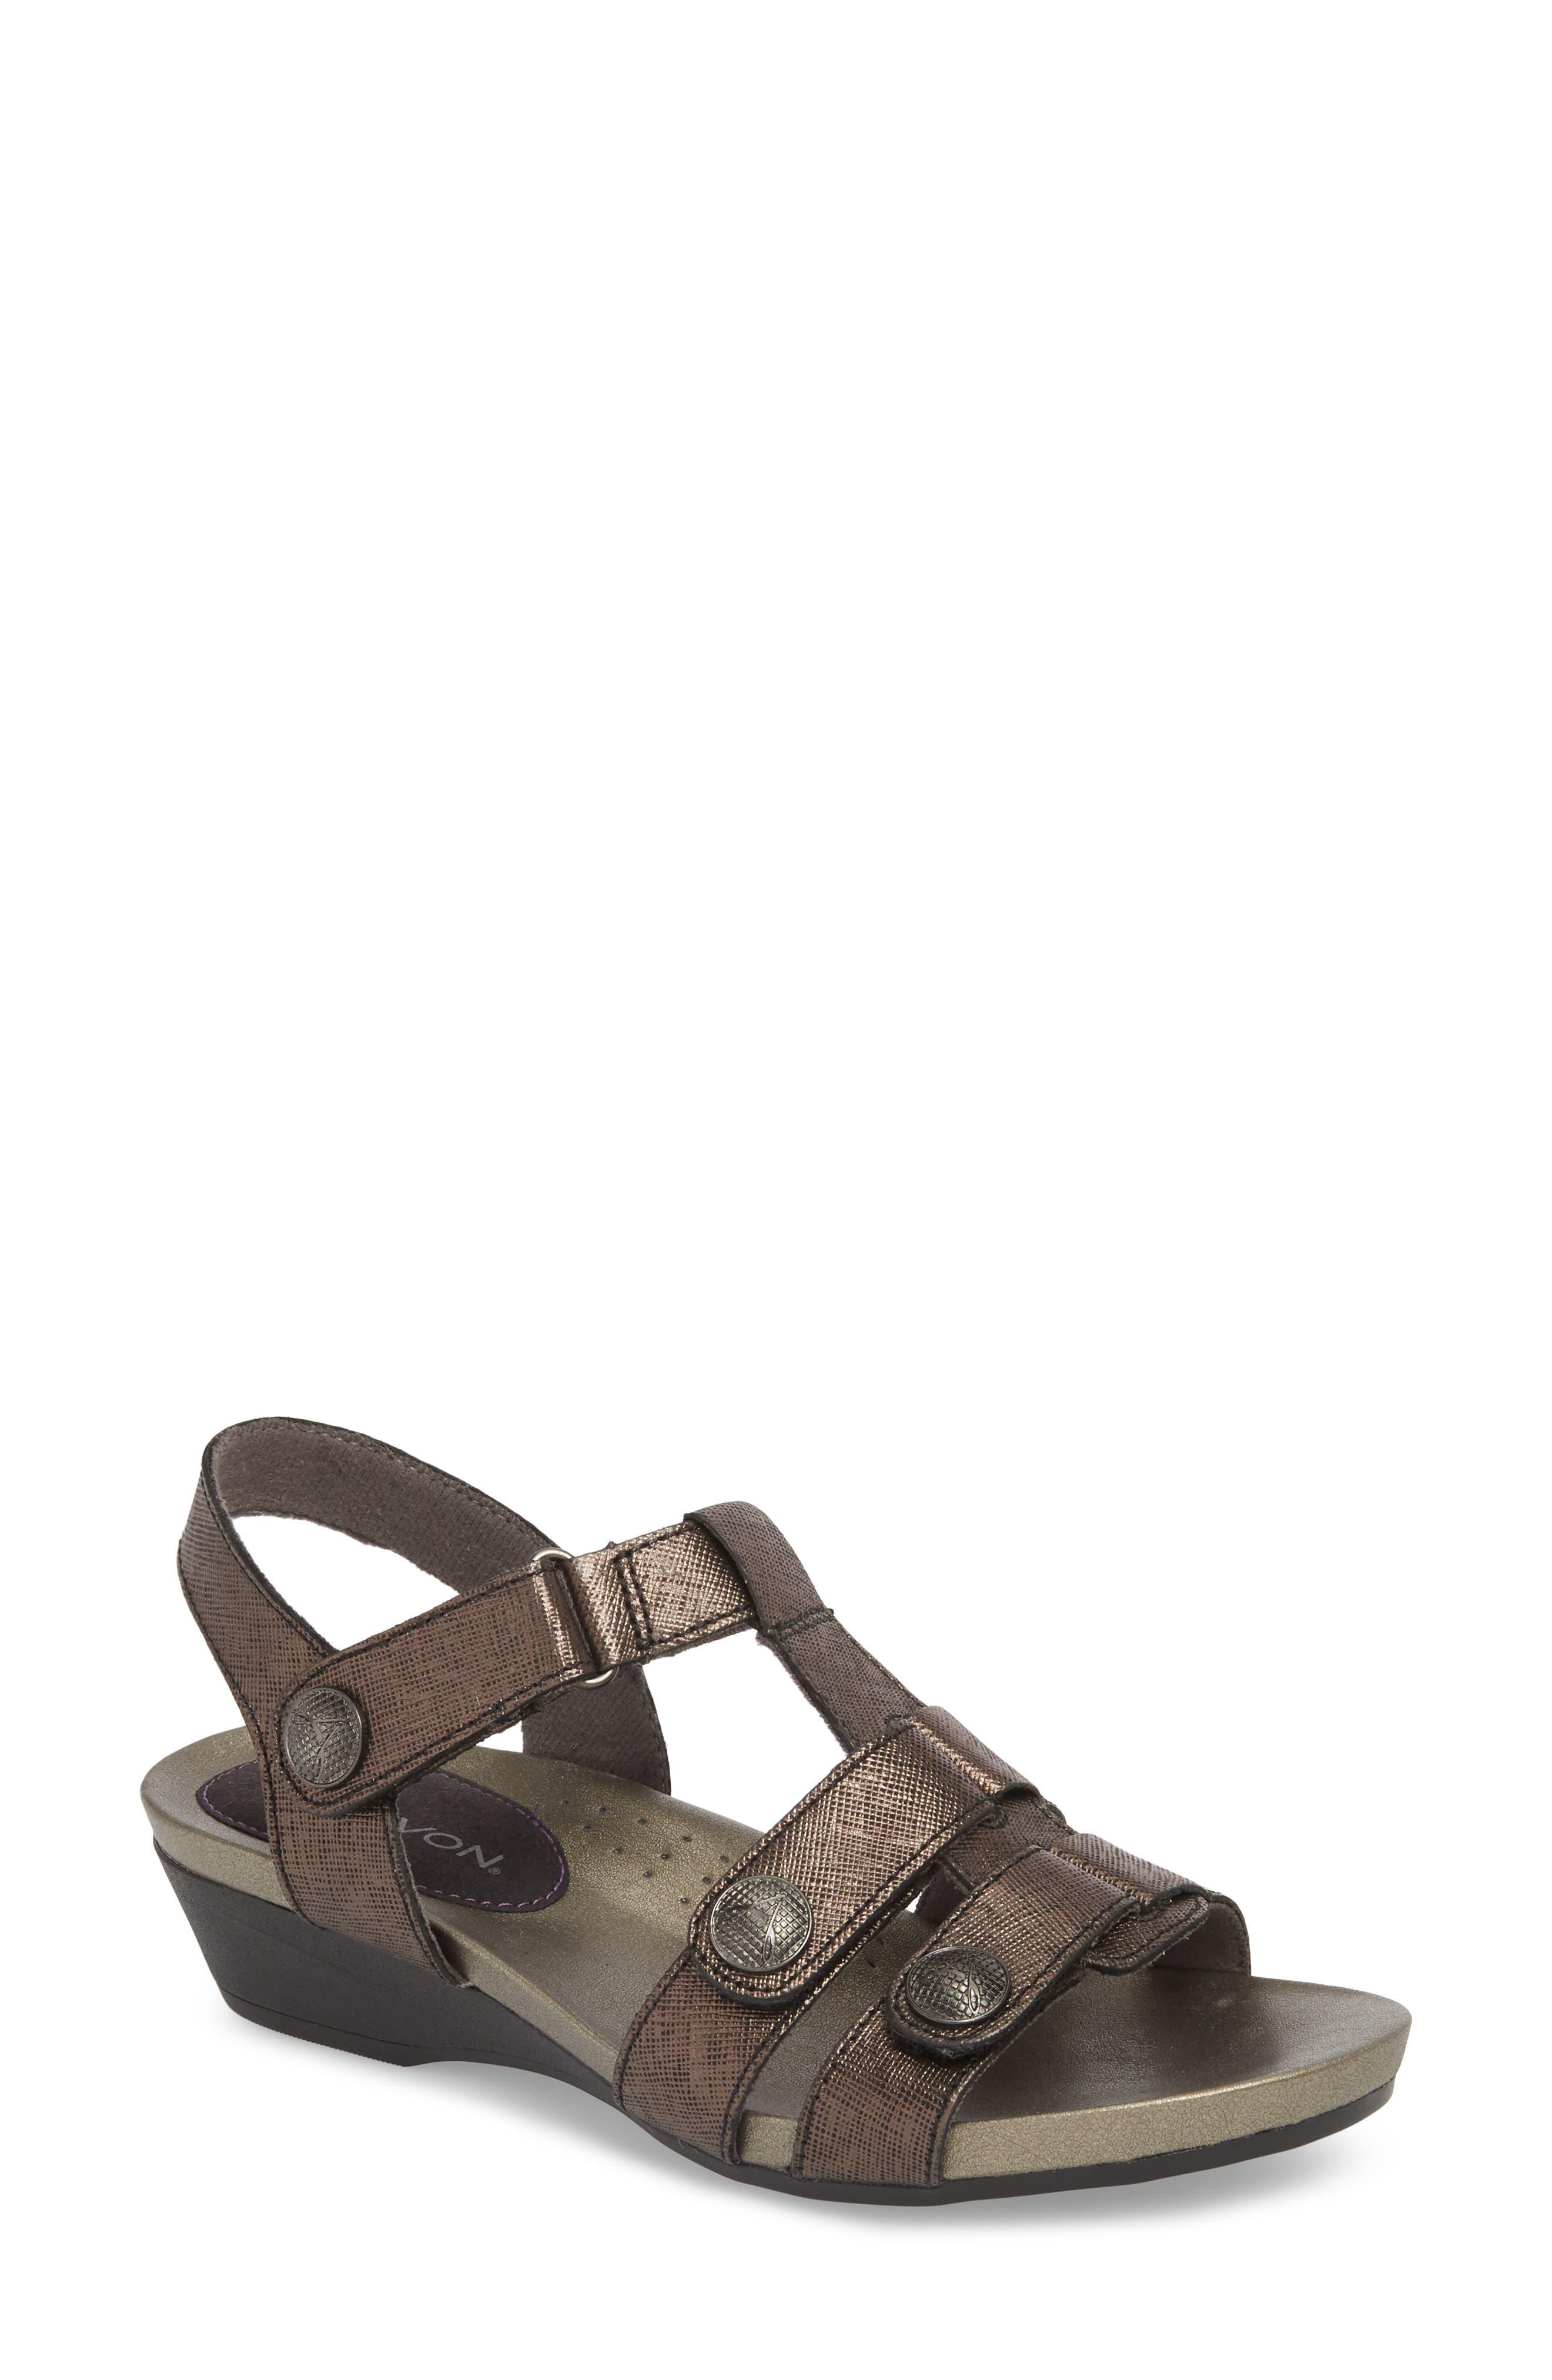 Standon Sandal,                         Main,                         color, Black Leather